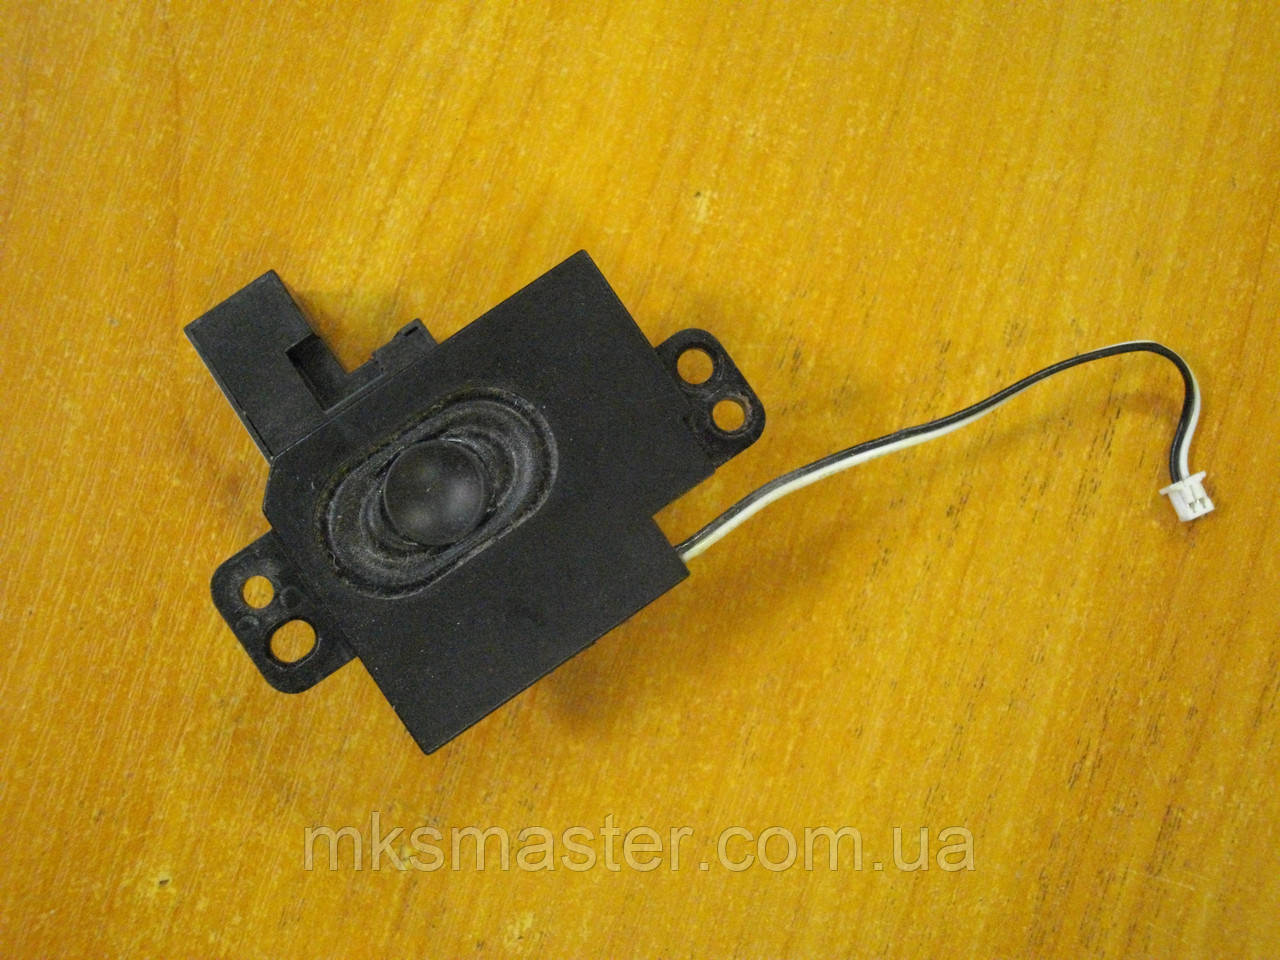 Динамик PK230005N00 Toshiba Satellite A135 A135-S226 бу